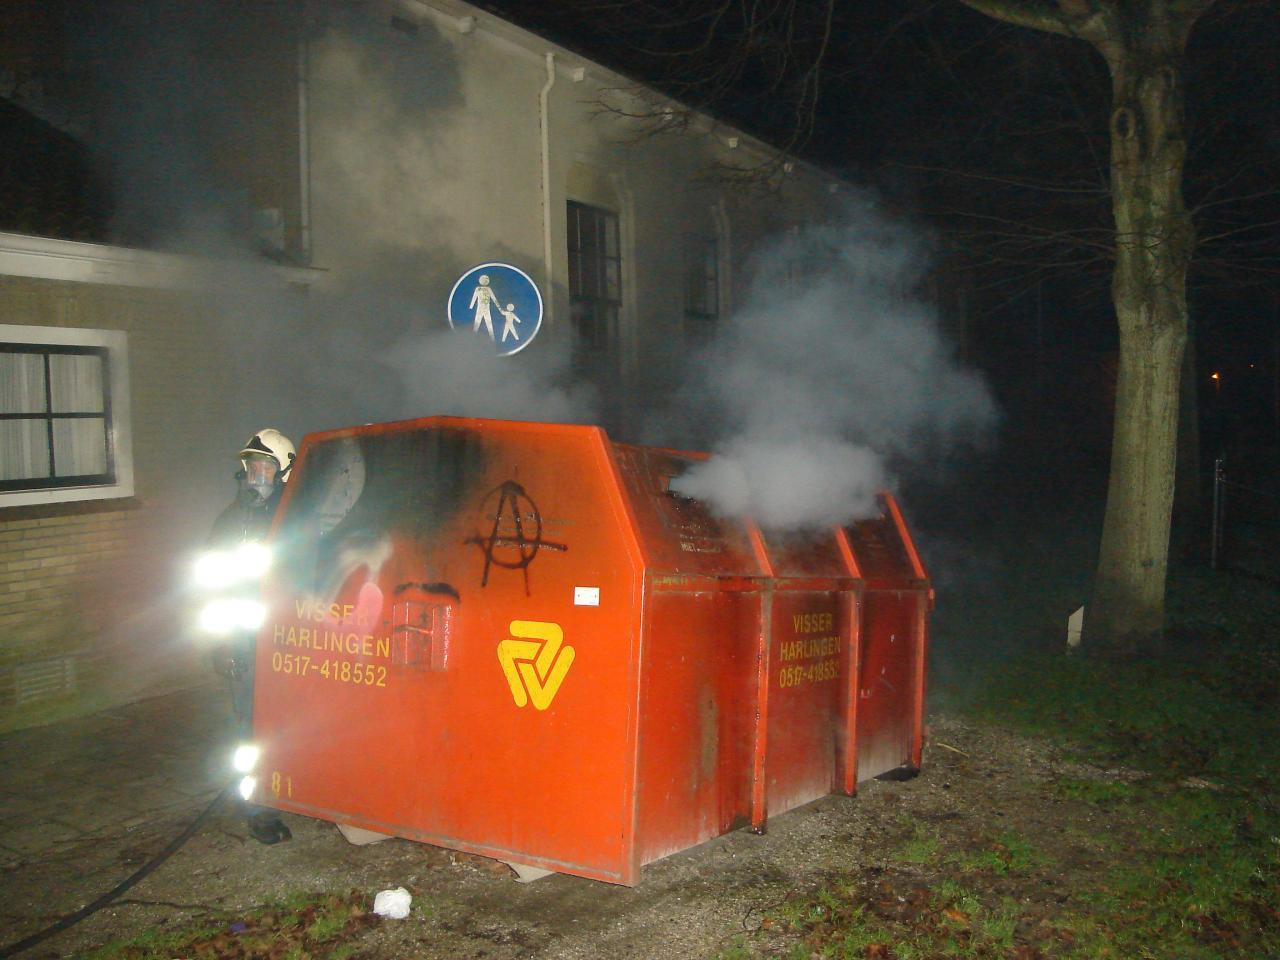 Containerbrand Stedelijke muziek vereniging